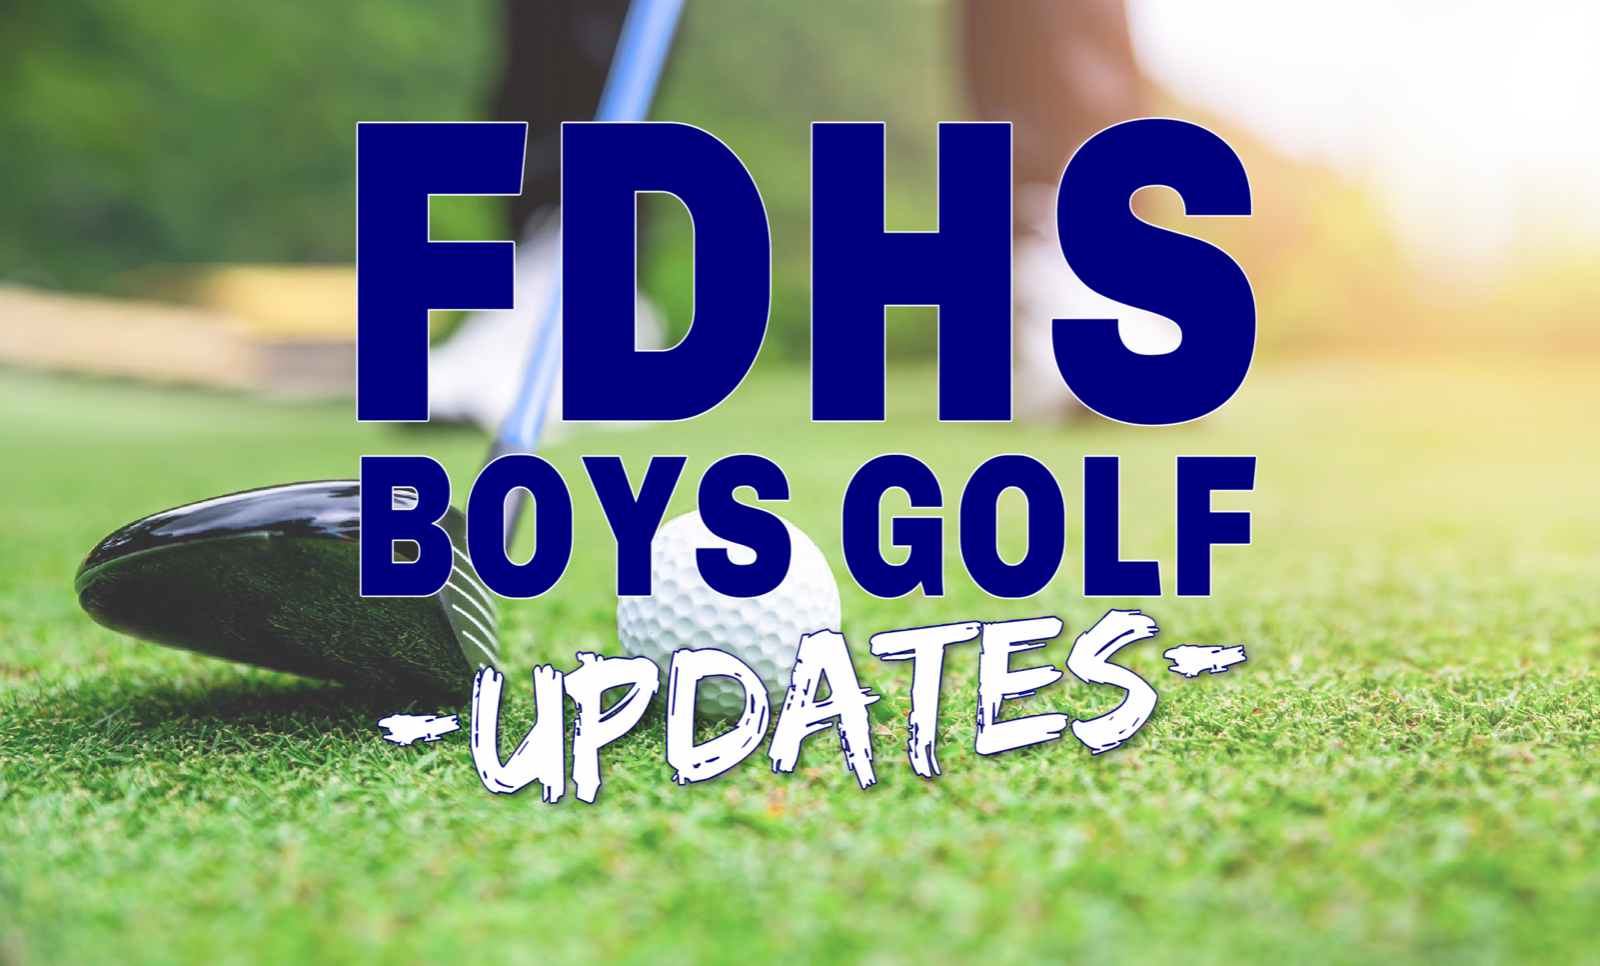 2021 FDHS BOYS GOLF UPDATES